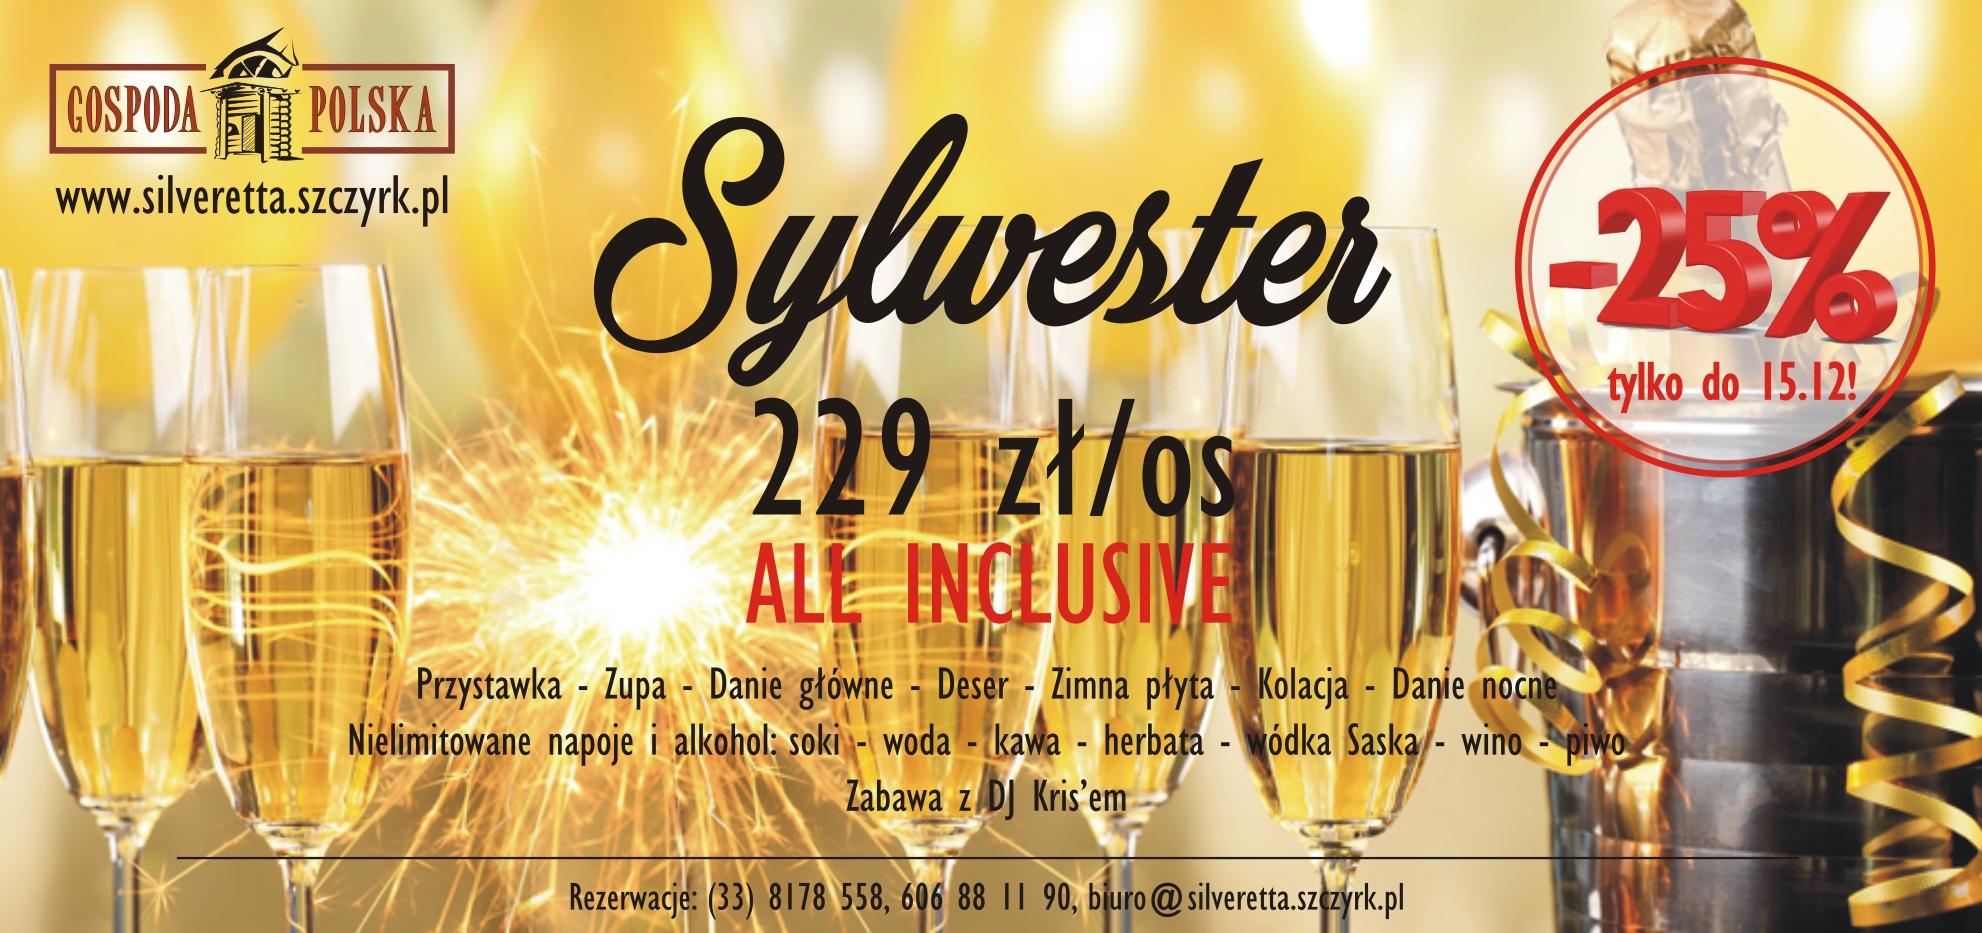 sylwester 2018 w górach - gospoda polska SUPER CENA